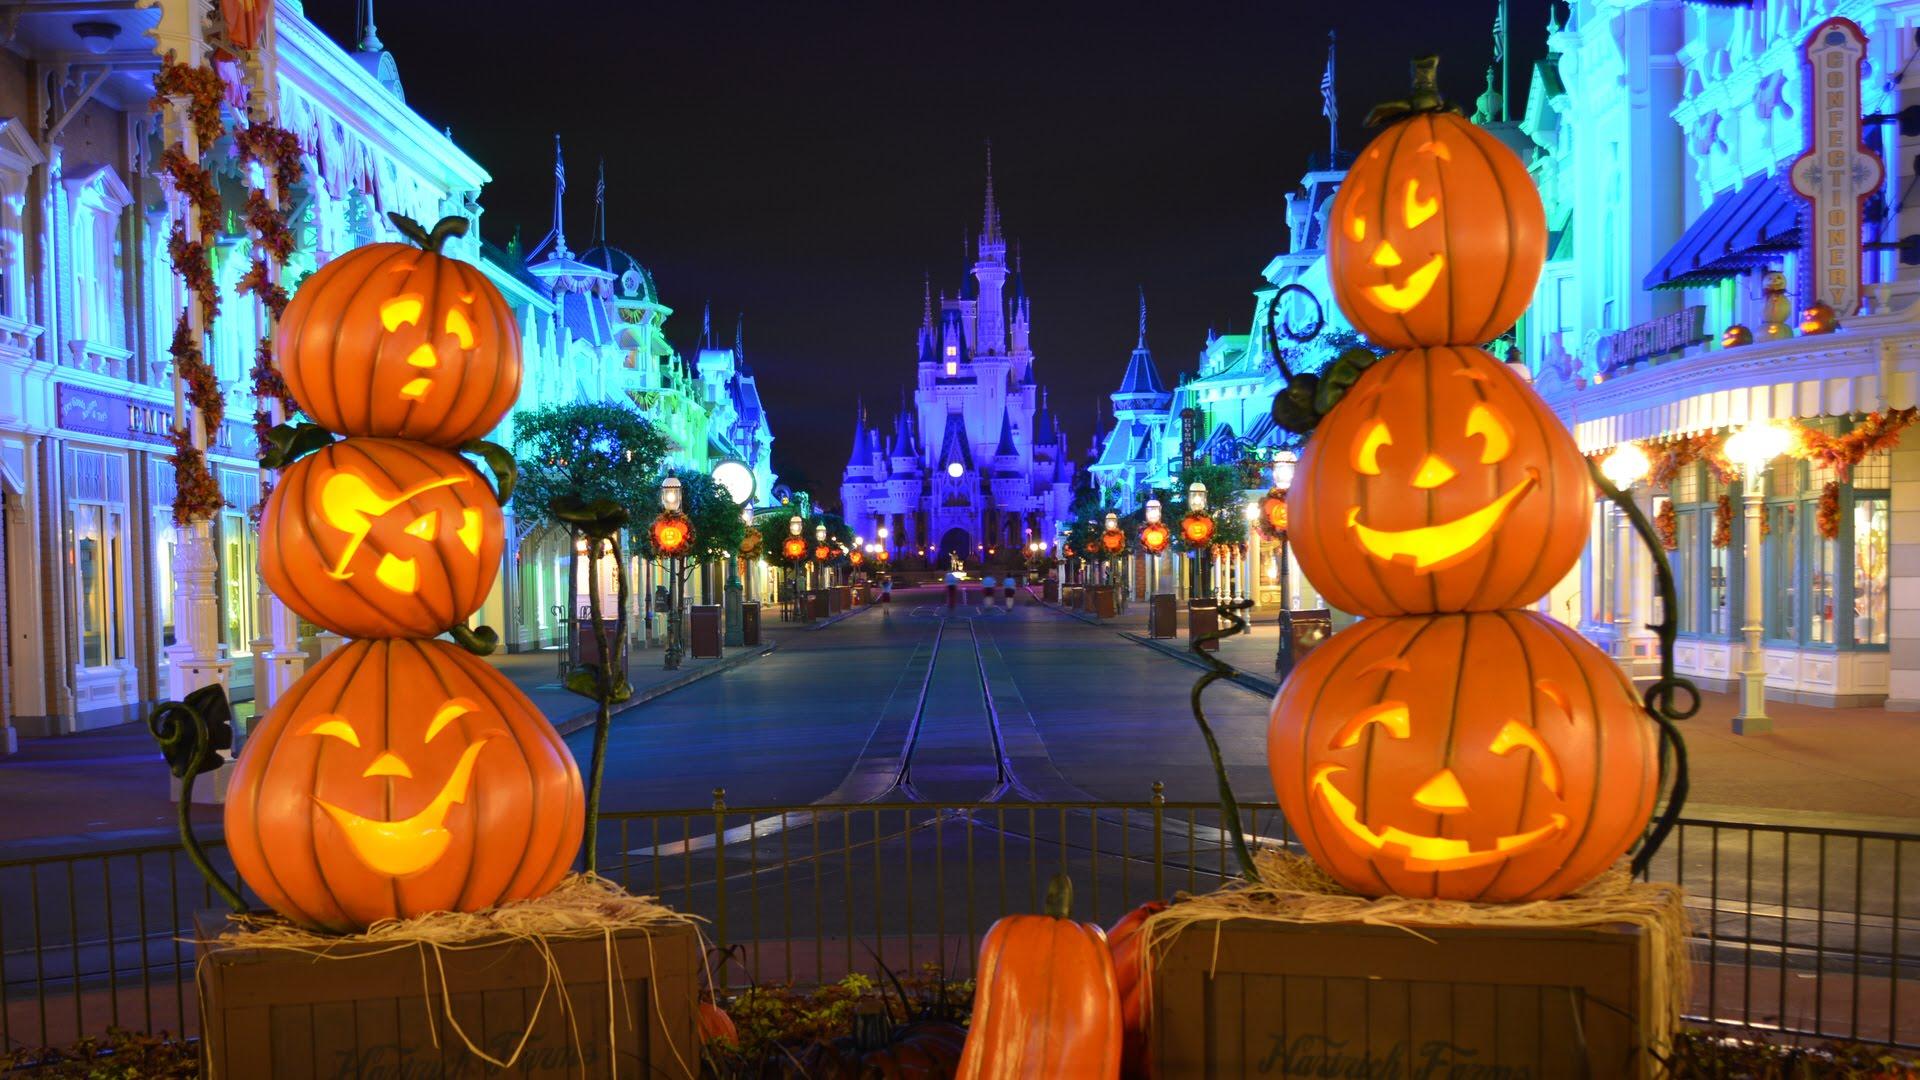 Walt Disney World Halloween 1280x720 Download Hd Wallpaper Wallpapertip